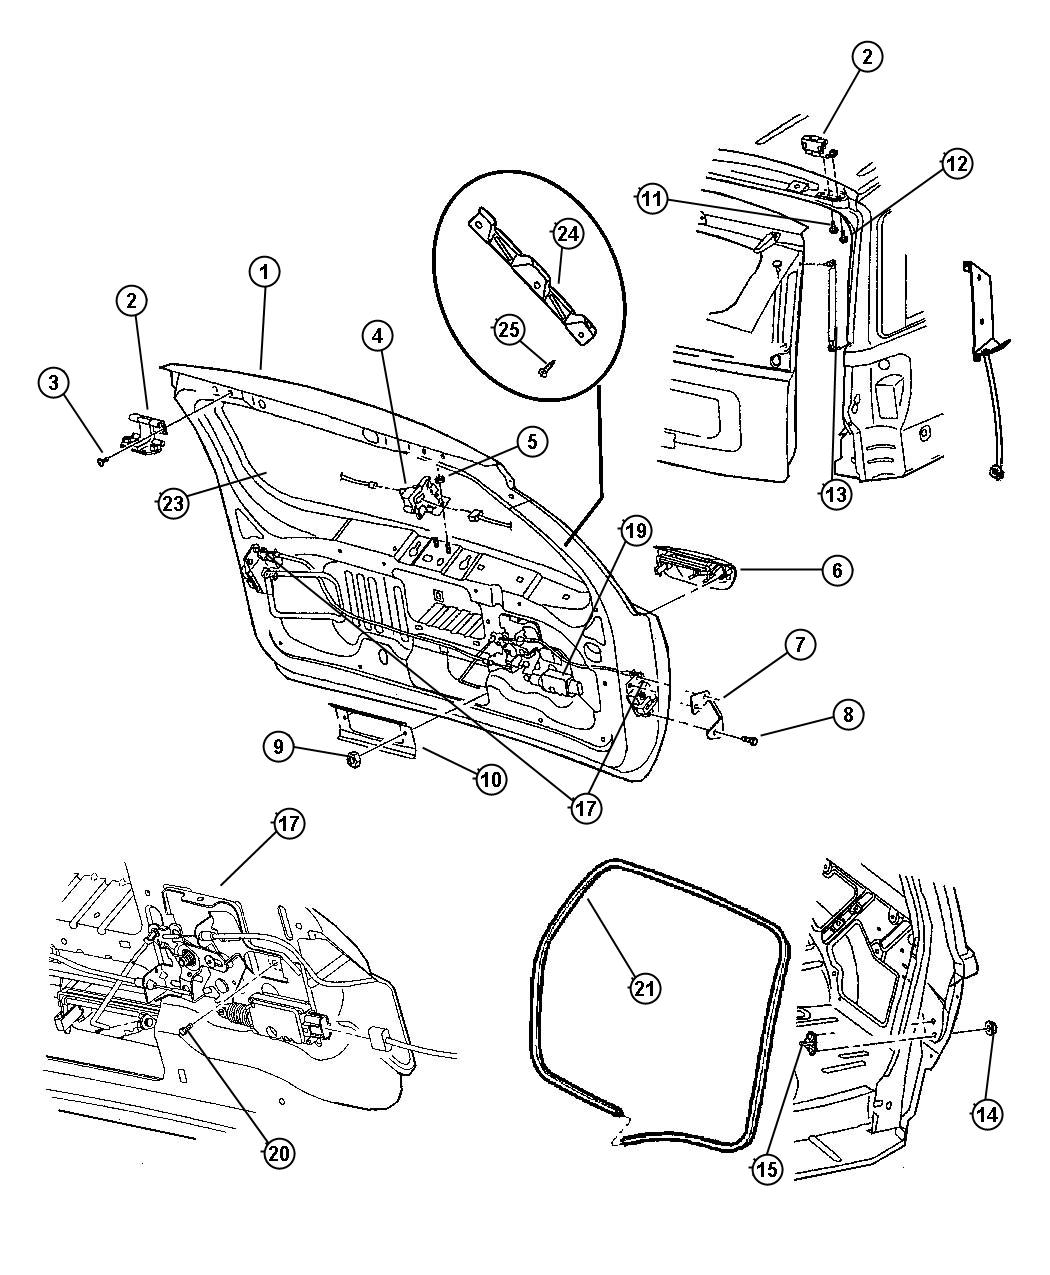 2003 dodge ram ignition switch wiring diagram 1998 honda crv parts 2500 sel auto